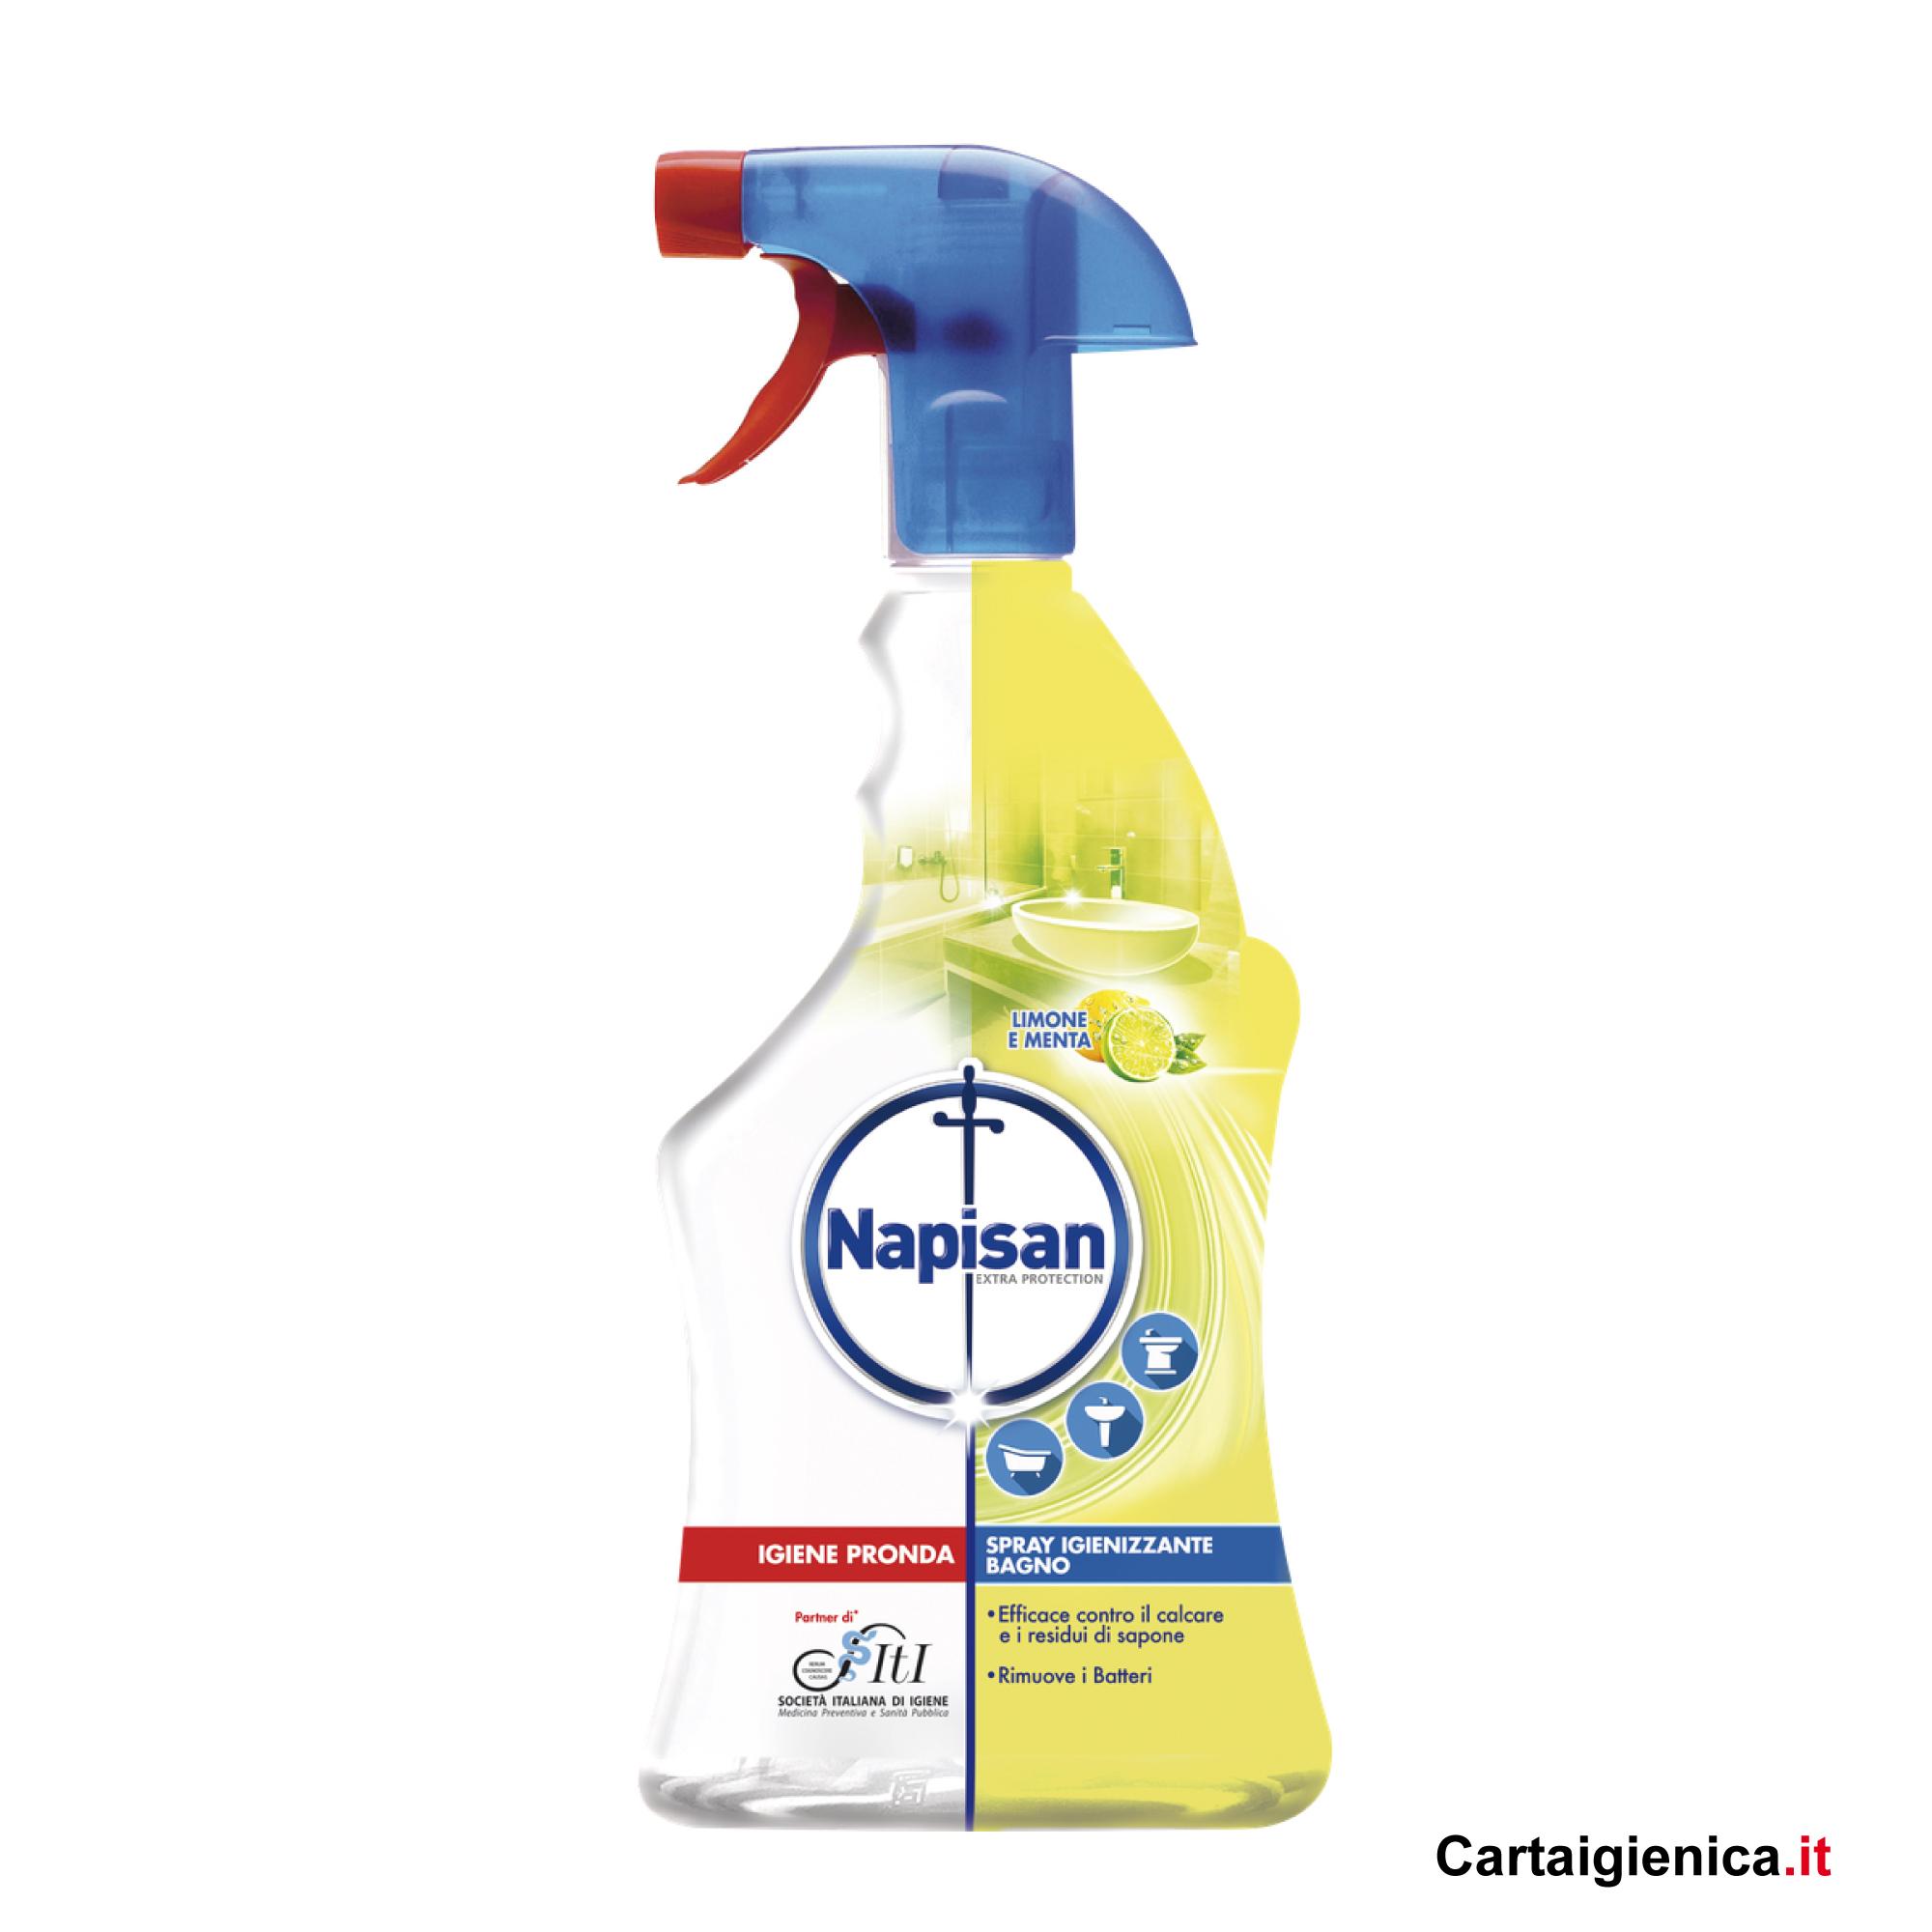 Napisan Igiene Profonda Spray Igienizzante Limone e Menta 500 ml